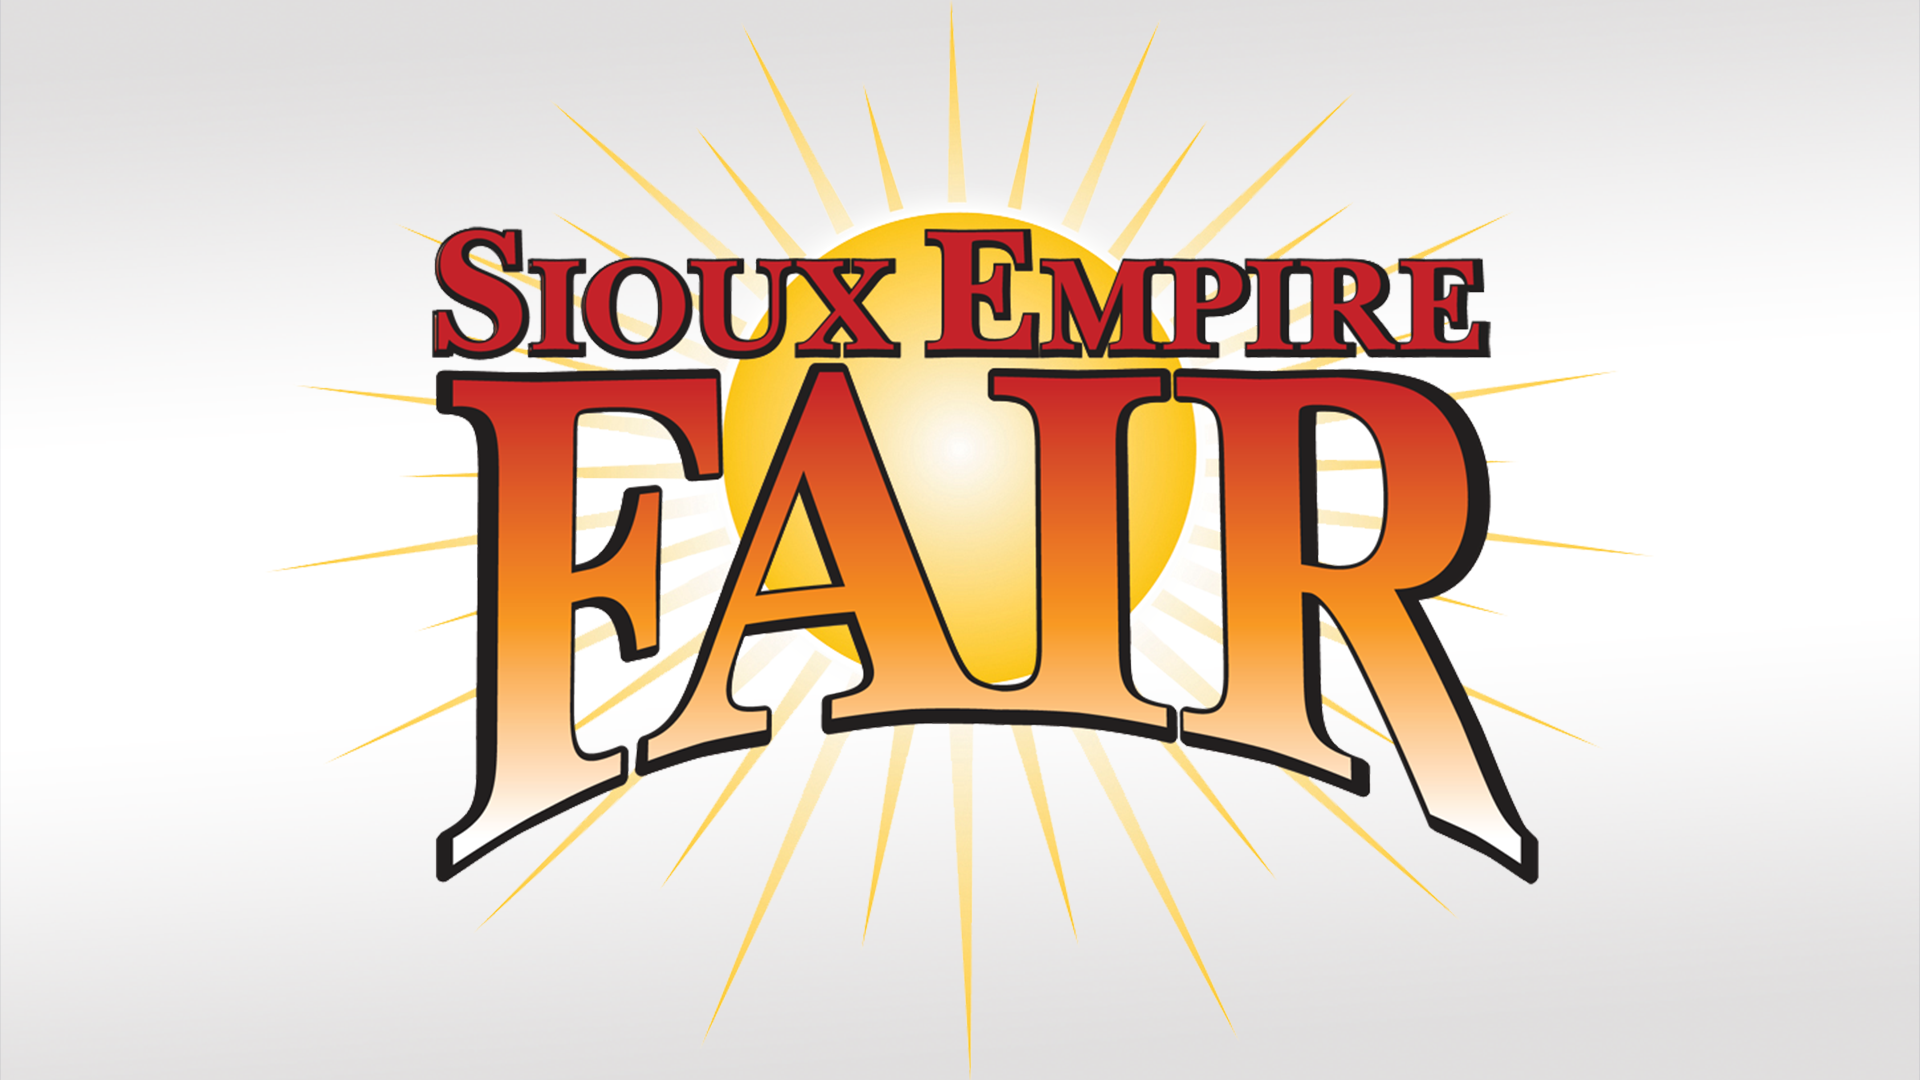 Sioux Empire Fair Opens Friday